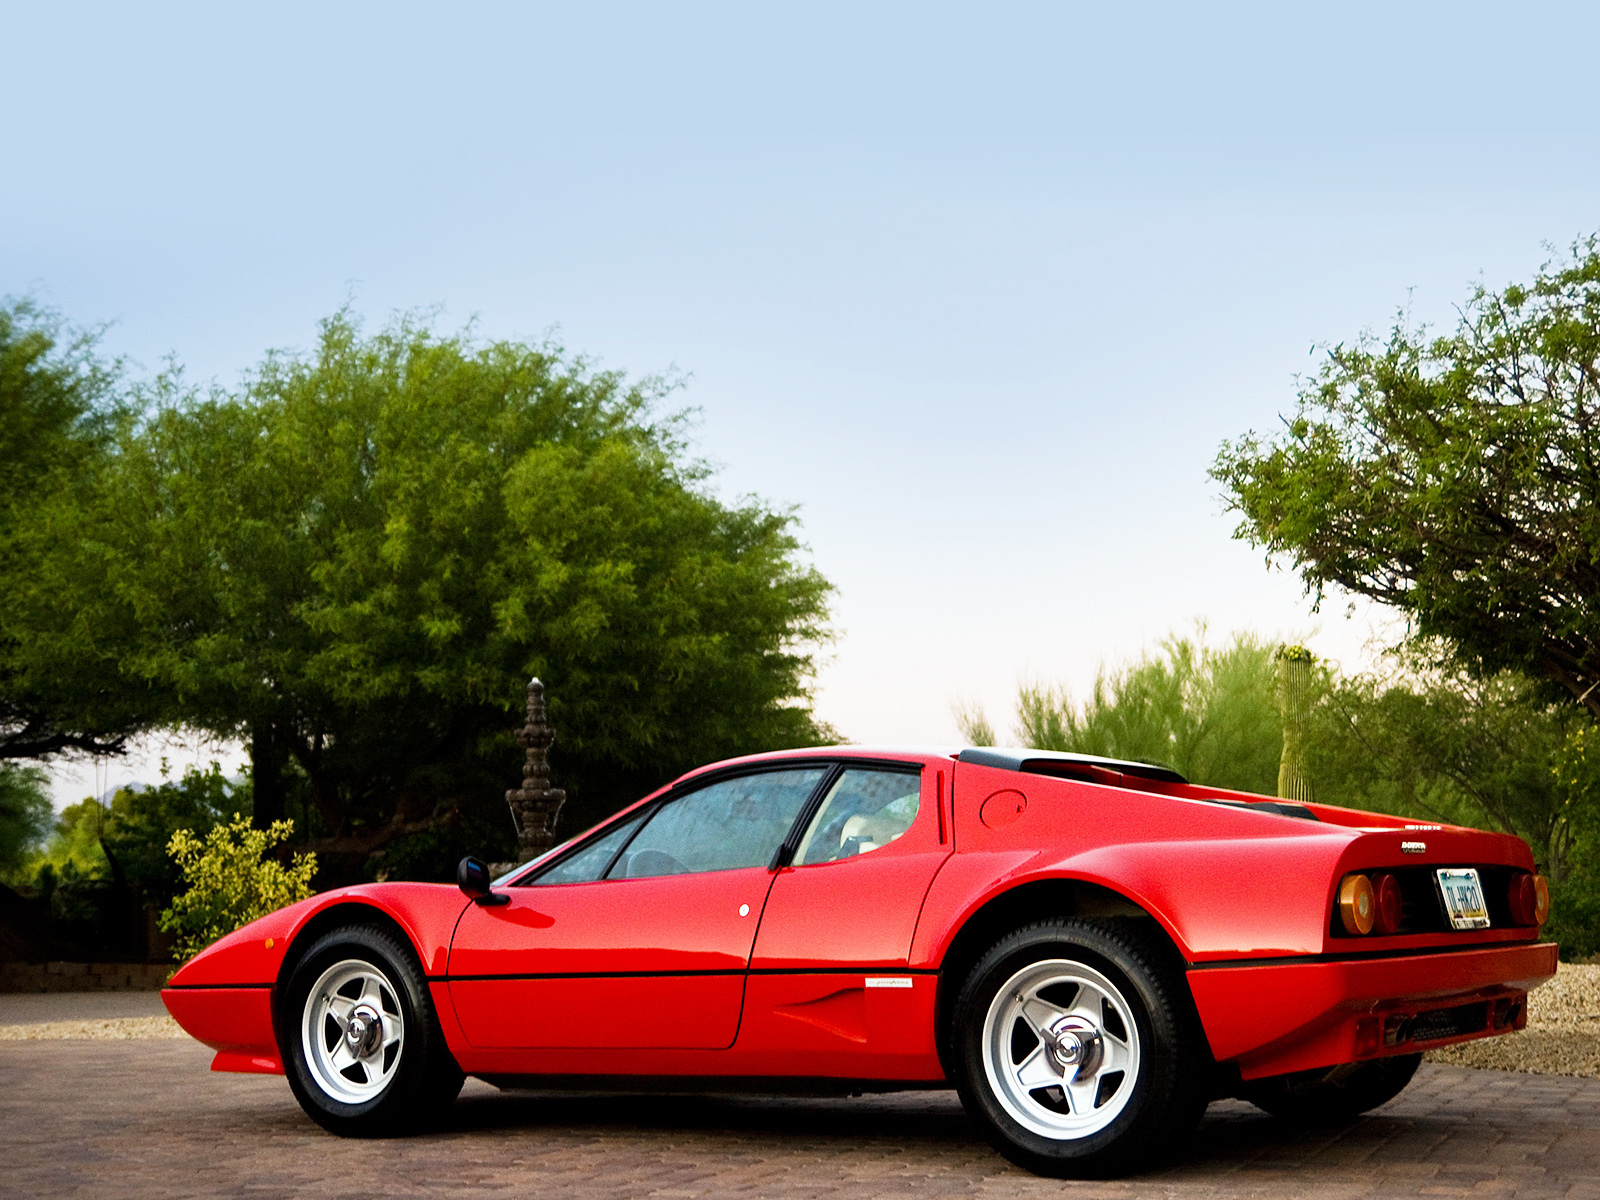 Ferrari-512-BBi-81-84-13 Remarkable Ferrari Mondial Rear Window Motor Cars Trend